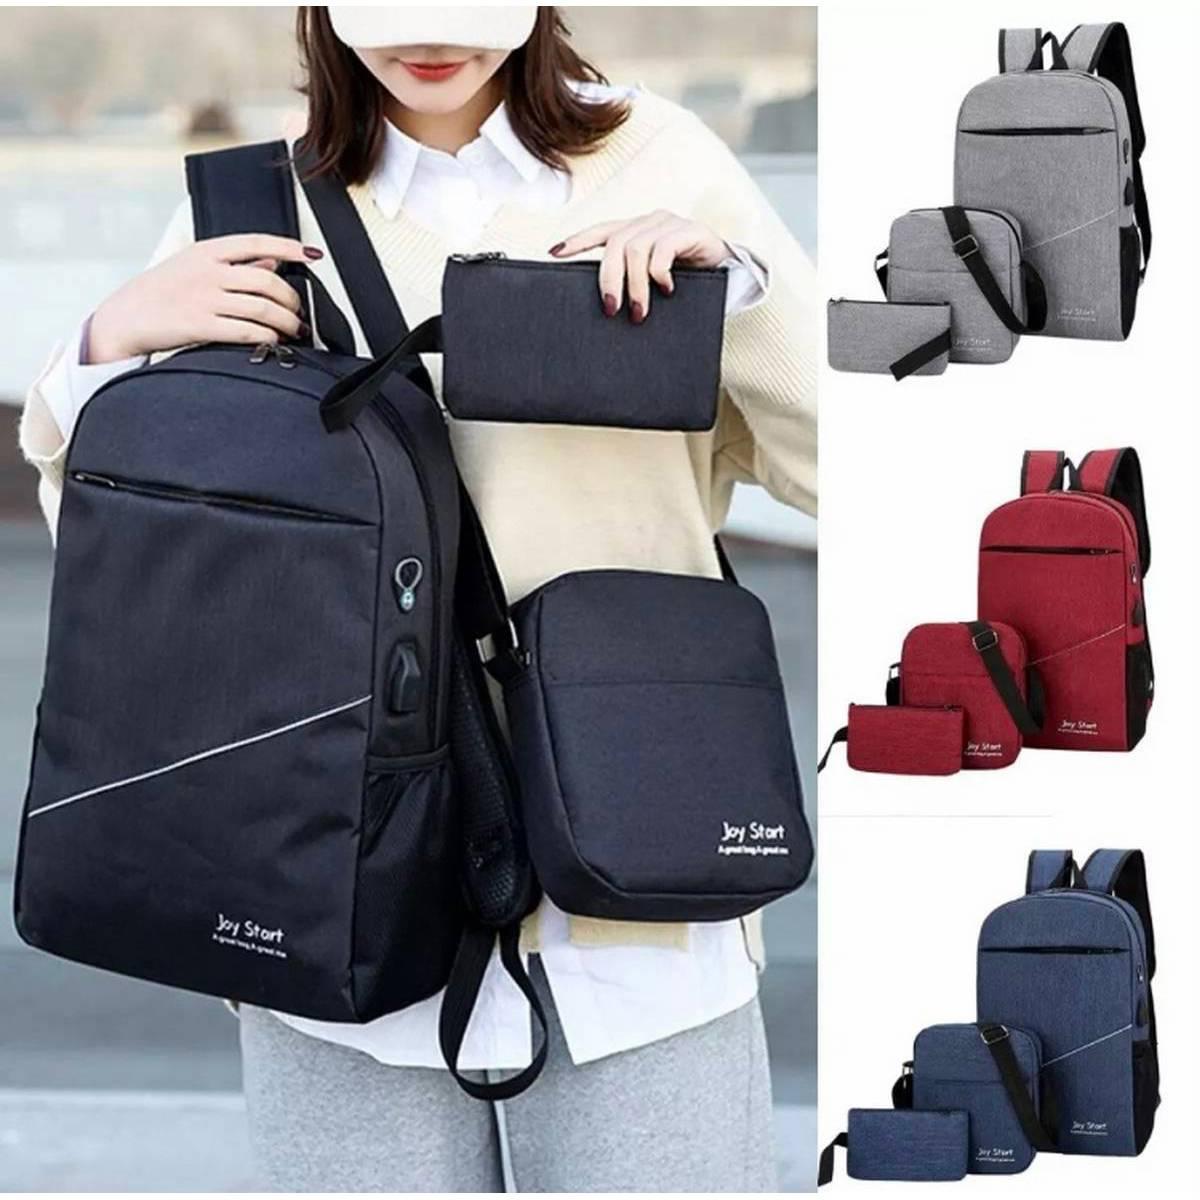 3pcs Set Laptop Backpack Men Business Water Repellent Hidden Zipper Backpacking Trip USB Charger Male Bag